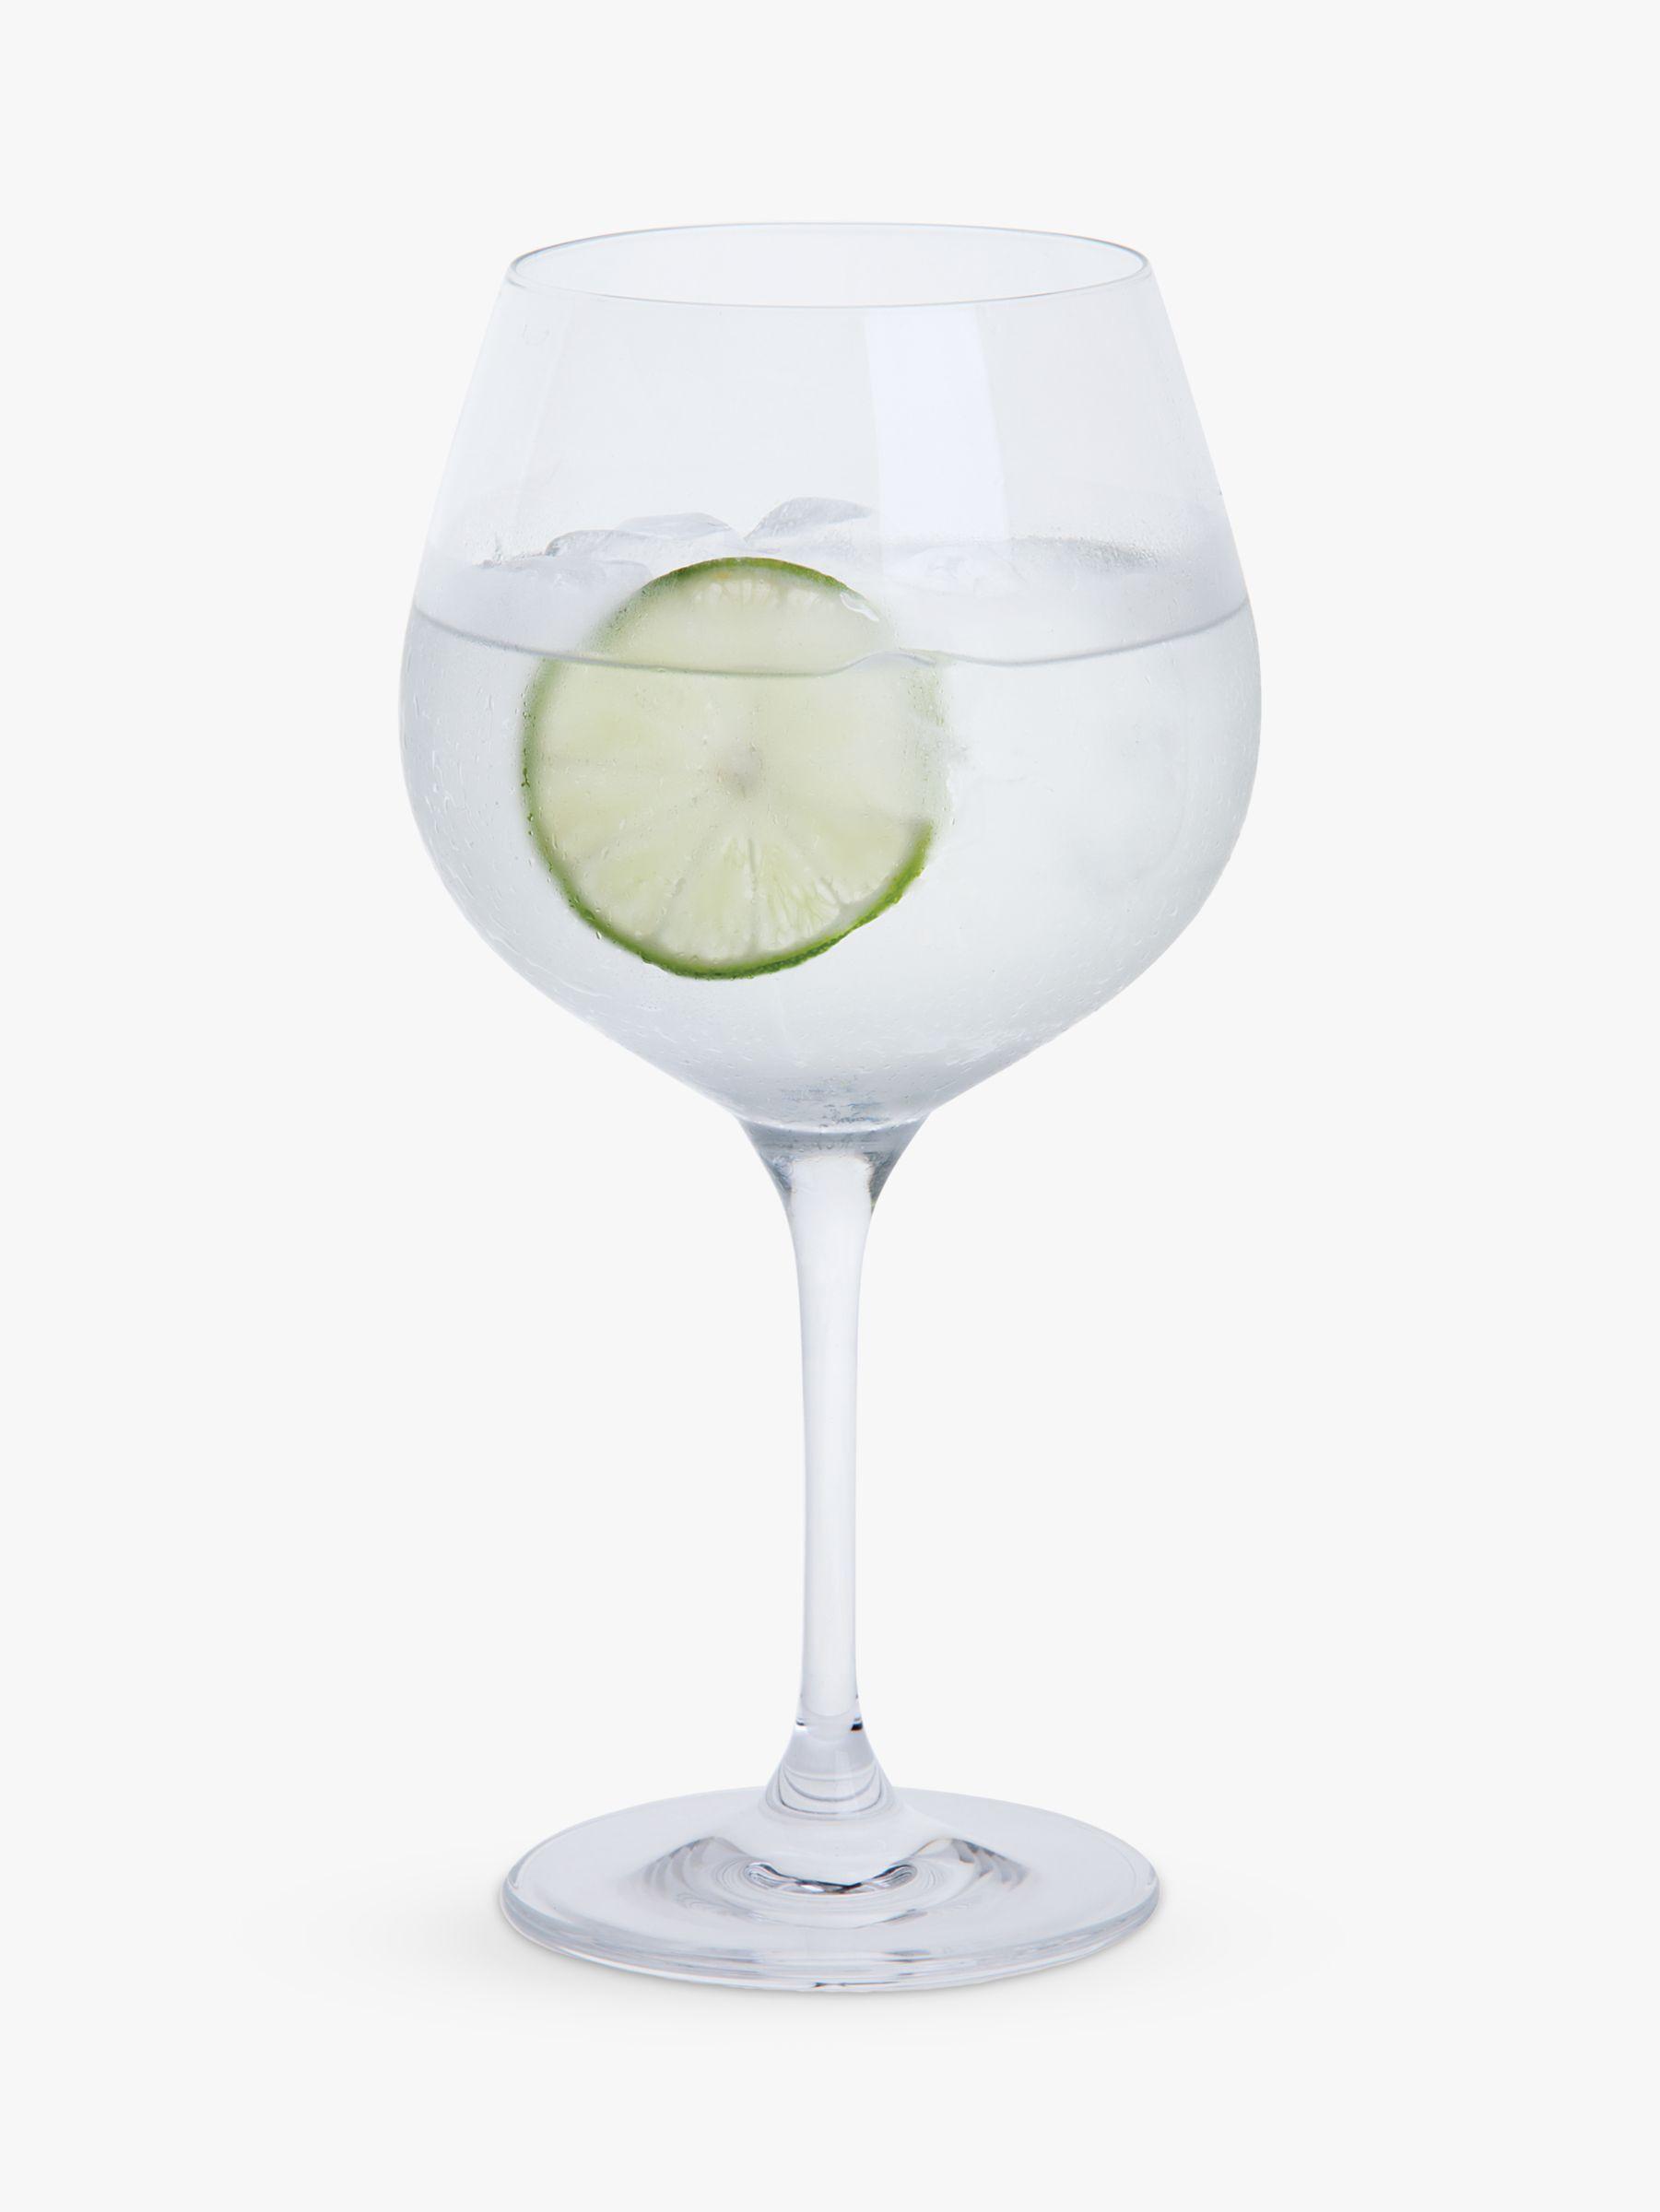 Dartington Crystal Dartington Crystal Just The One G and T Gin Copa Glass, 610ml